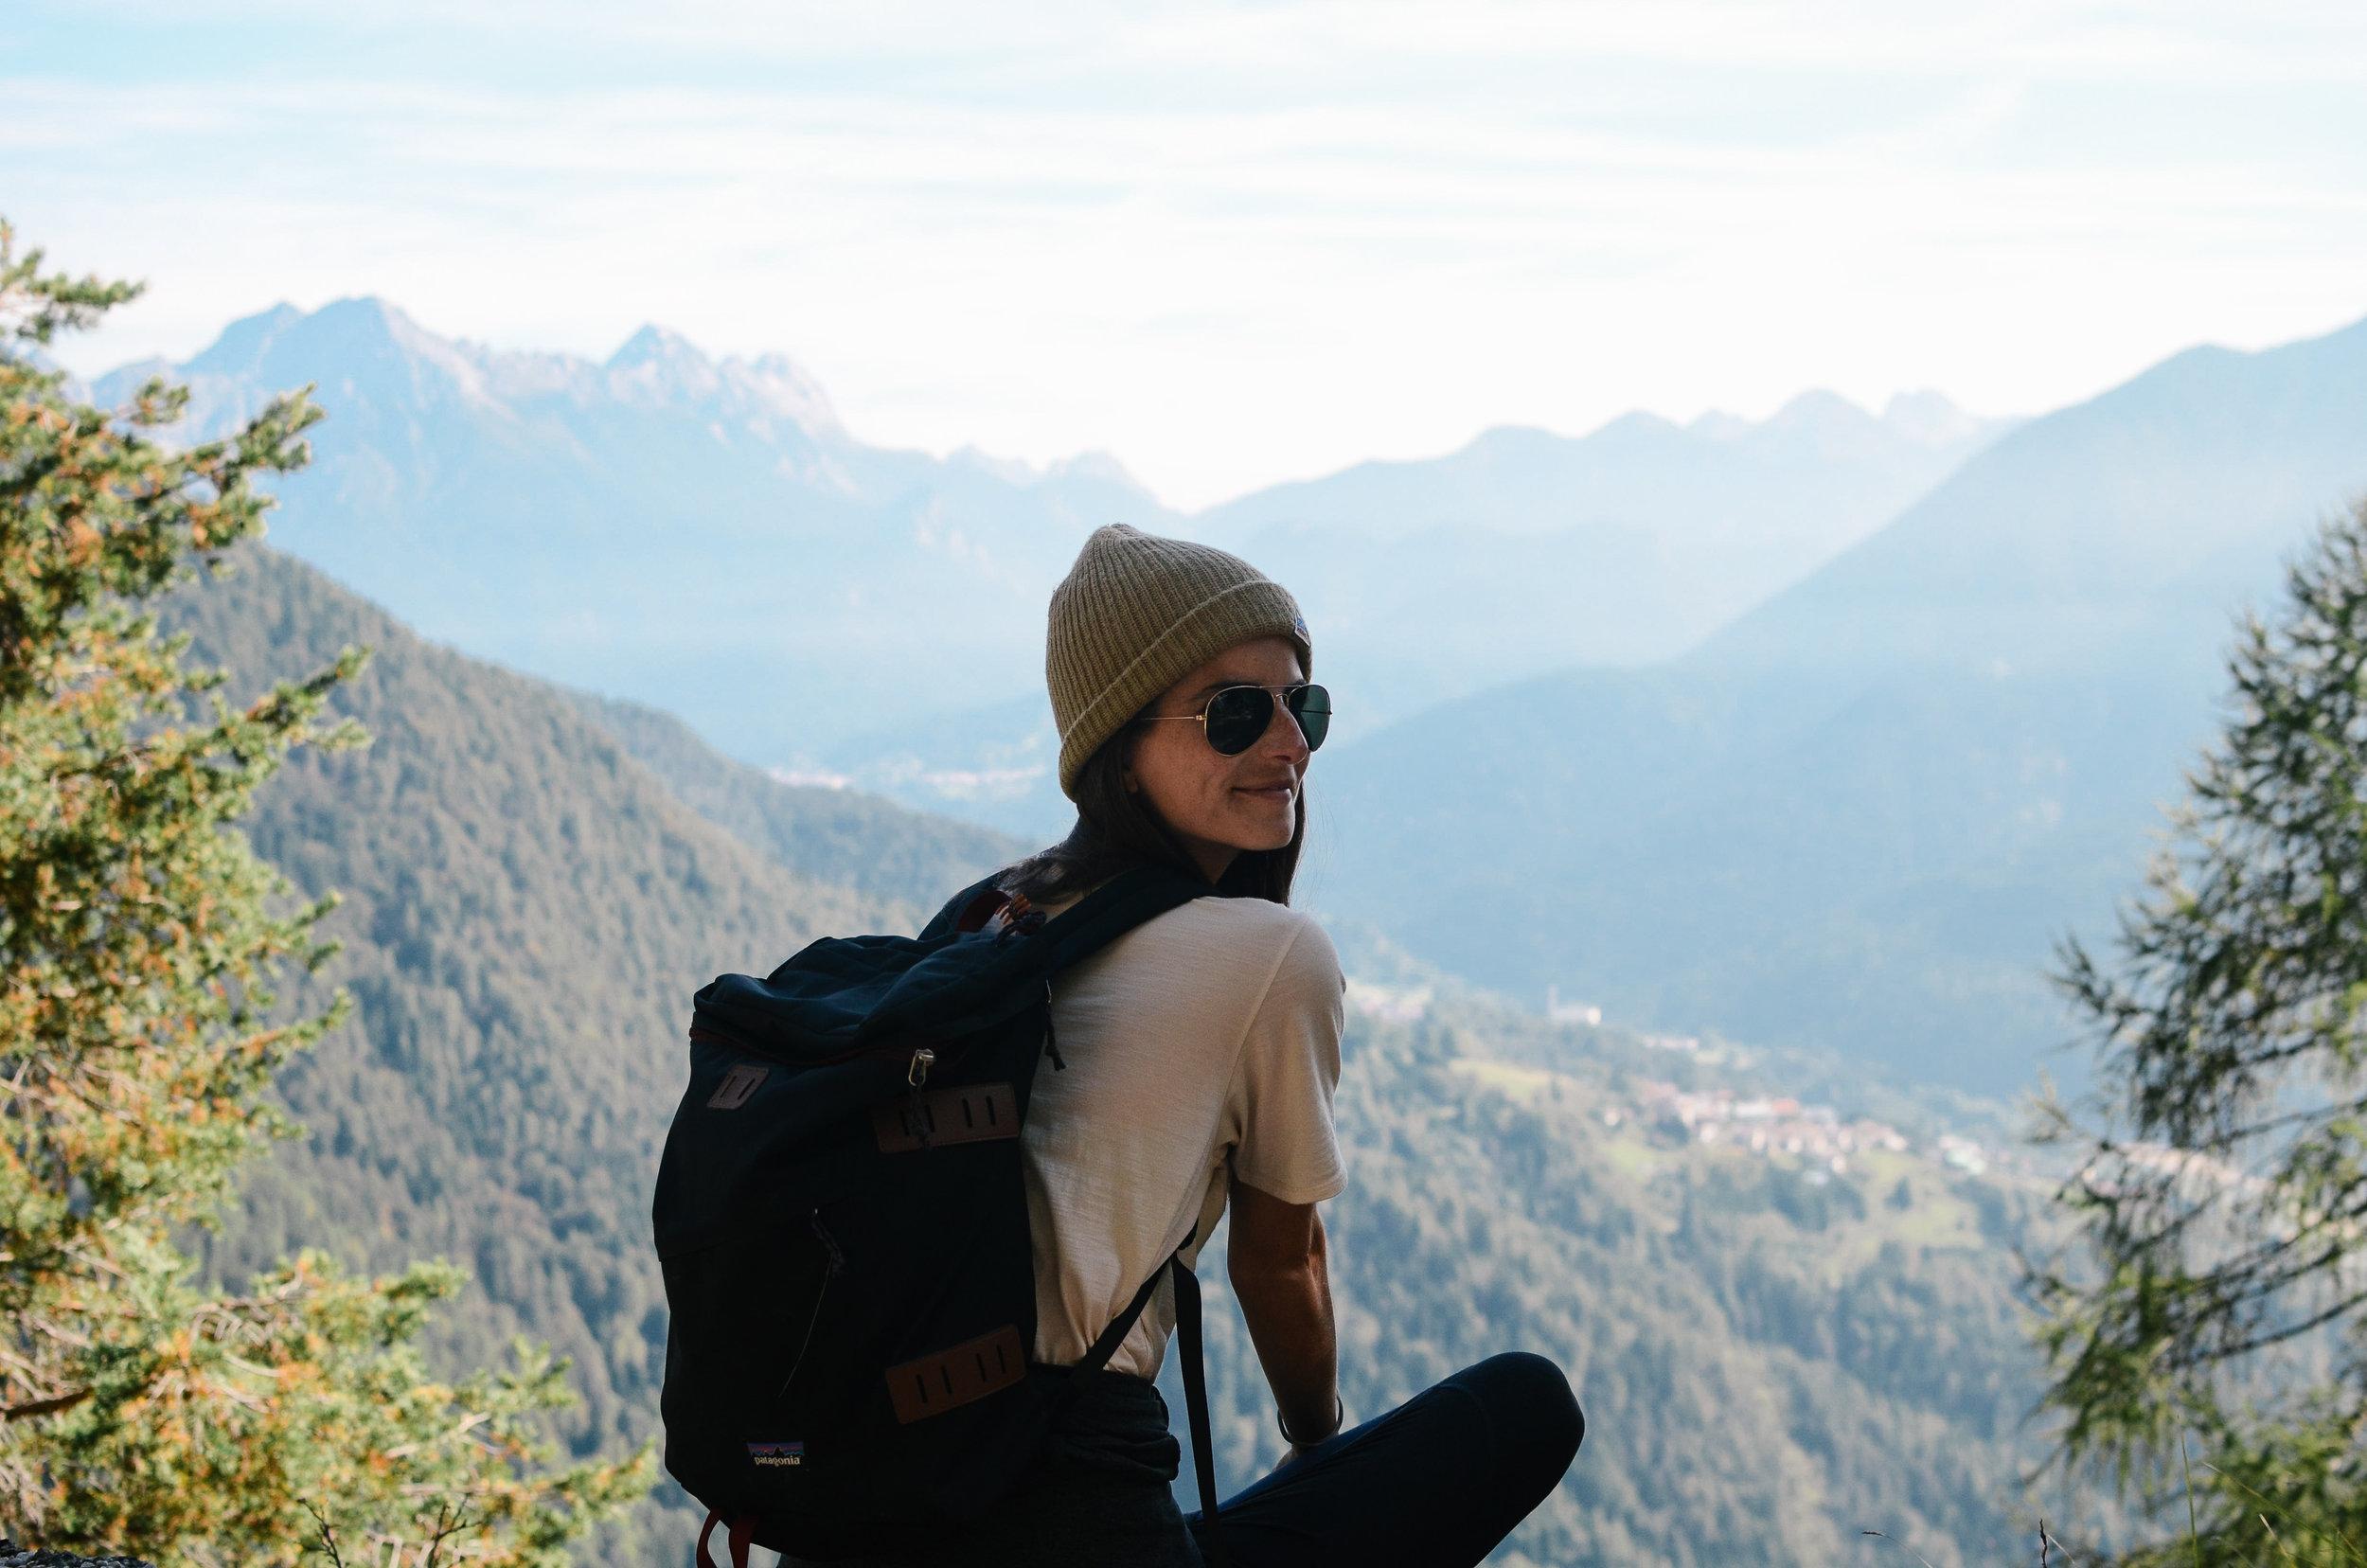 adventure-in-italy-3-hikes-dolomites-hiking-travel-blog-tyrol-1.jpg